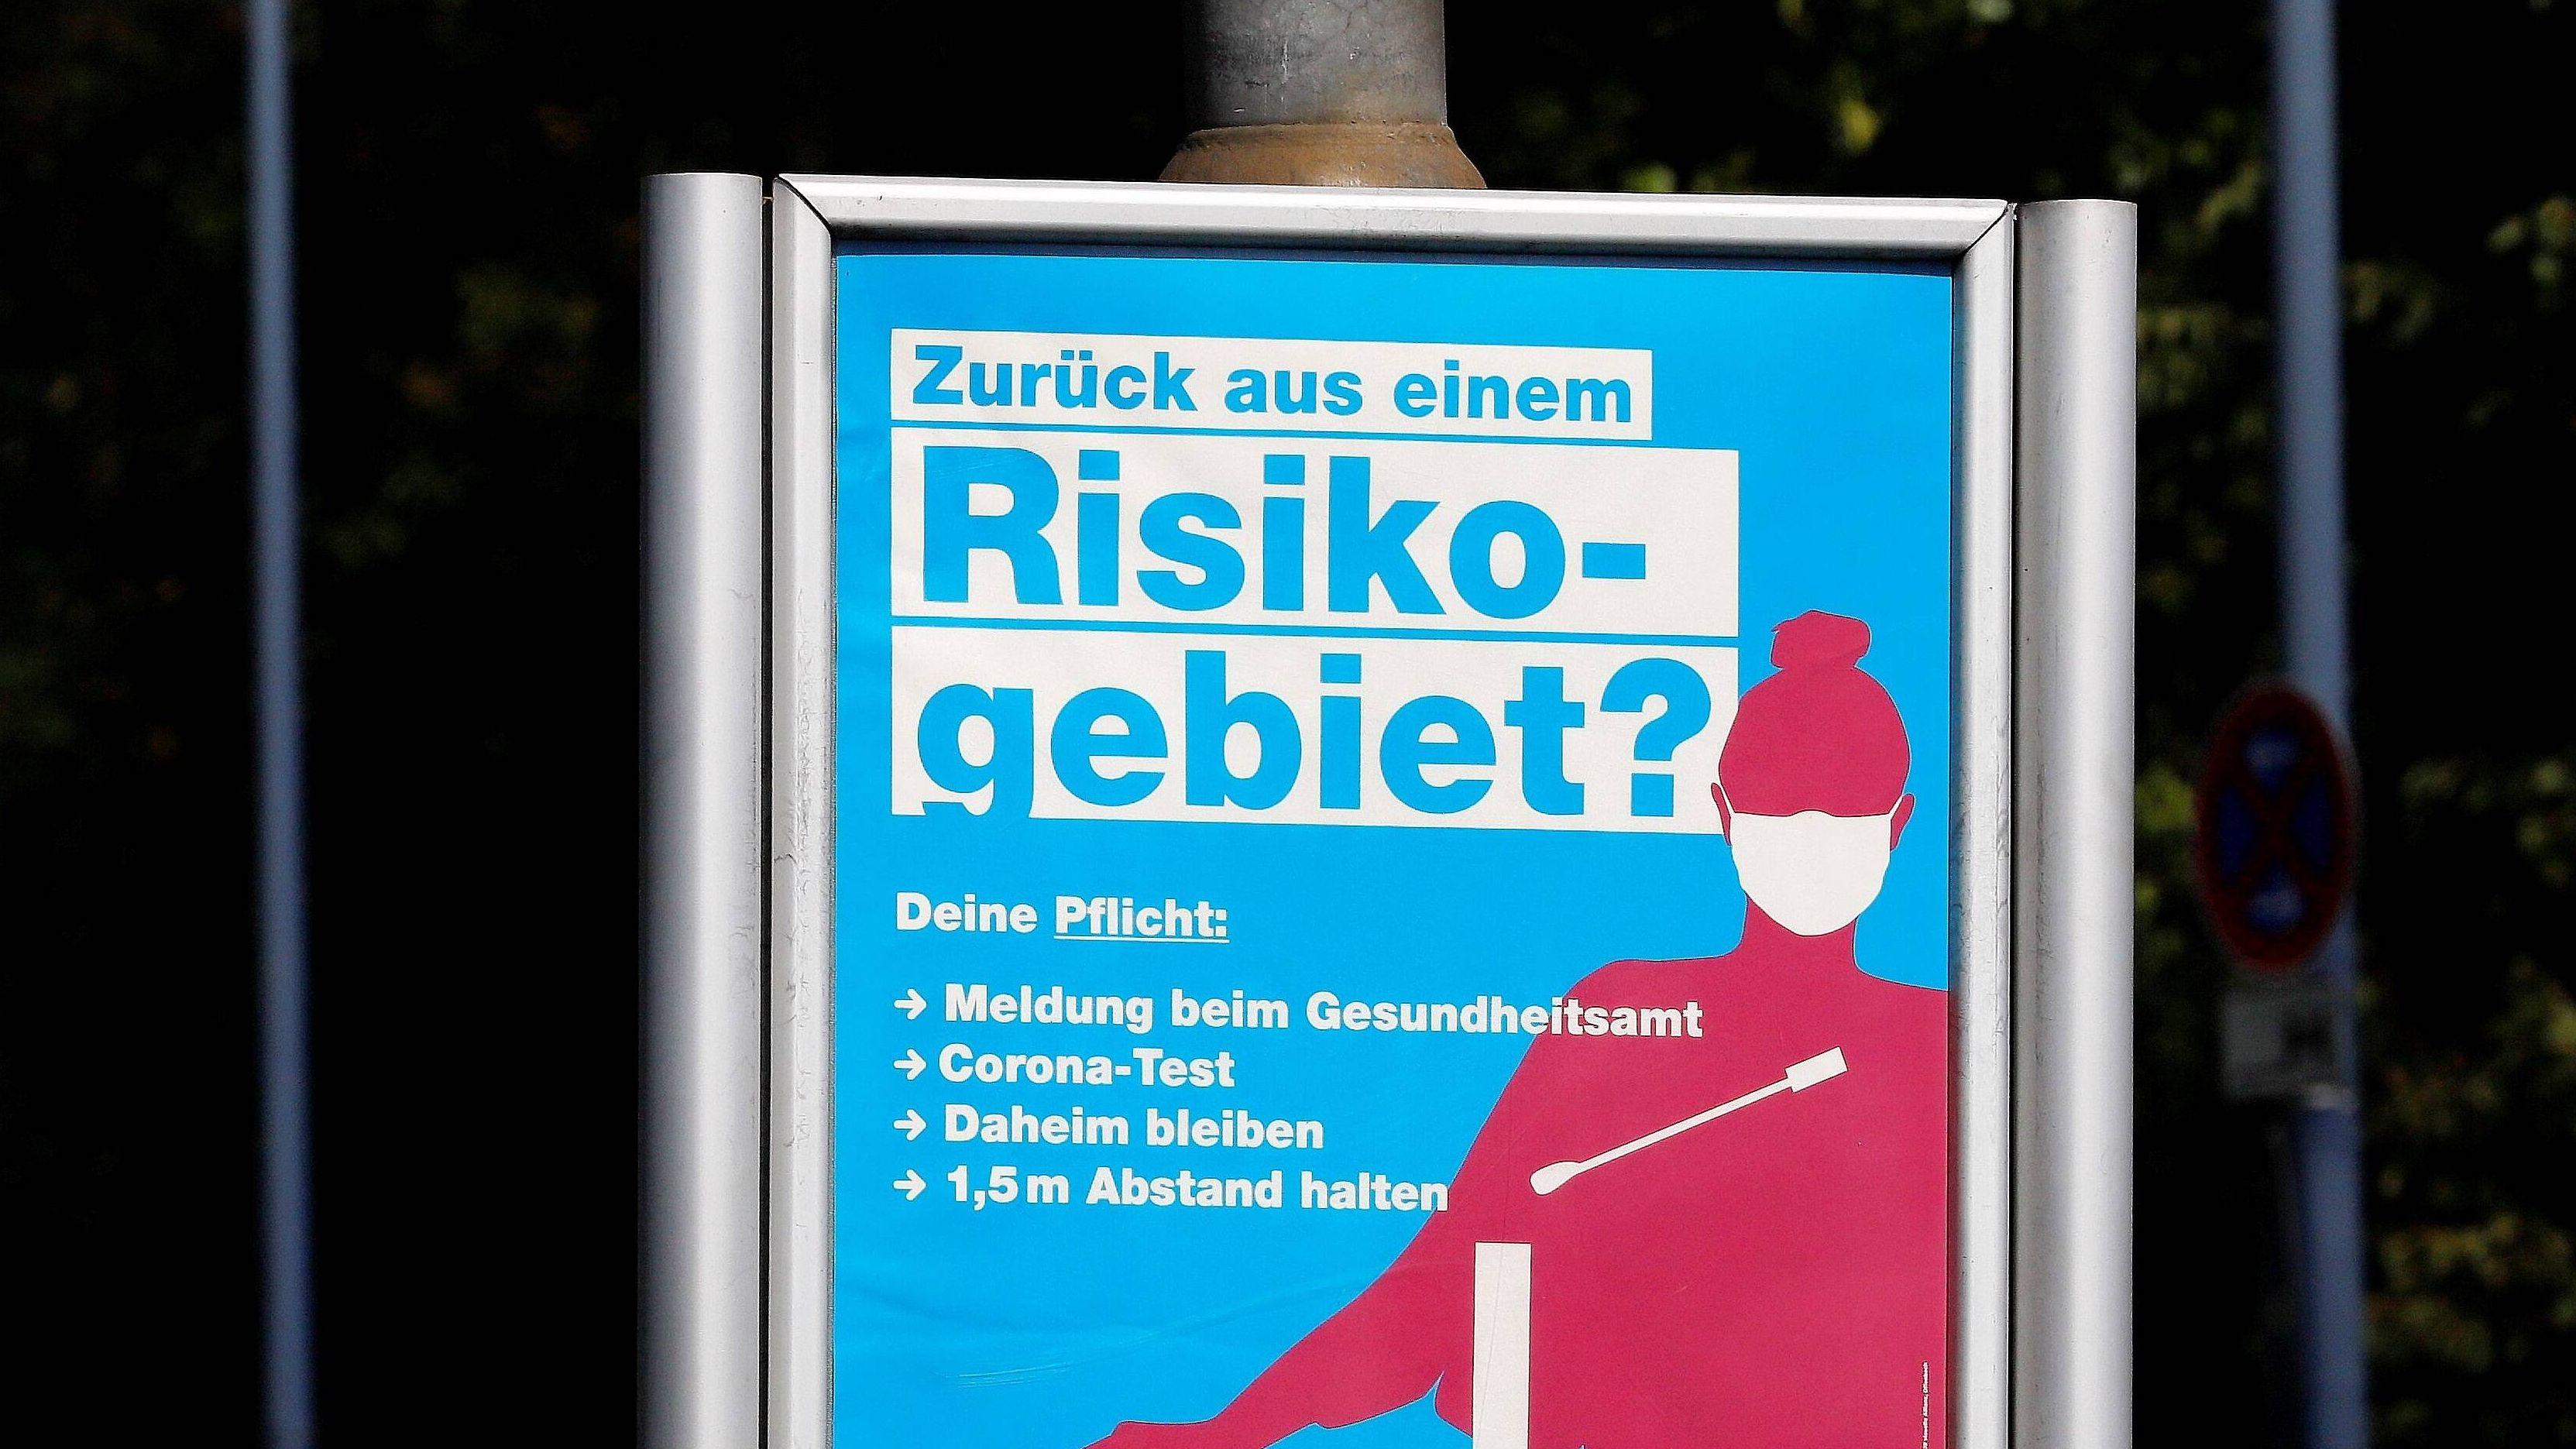 Tschechien, Luxemburg und Tirol nun Corona-Risikogebiete